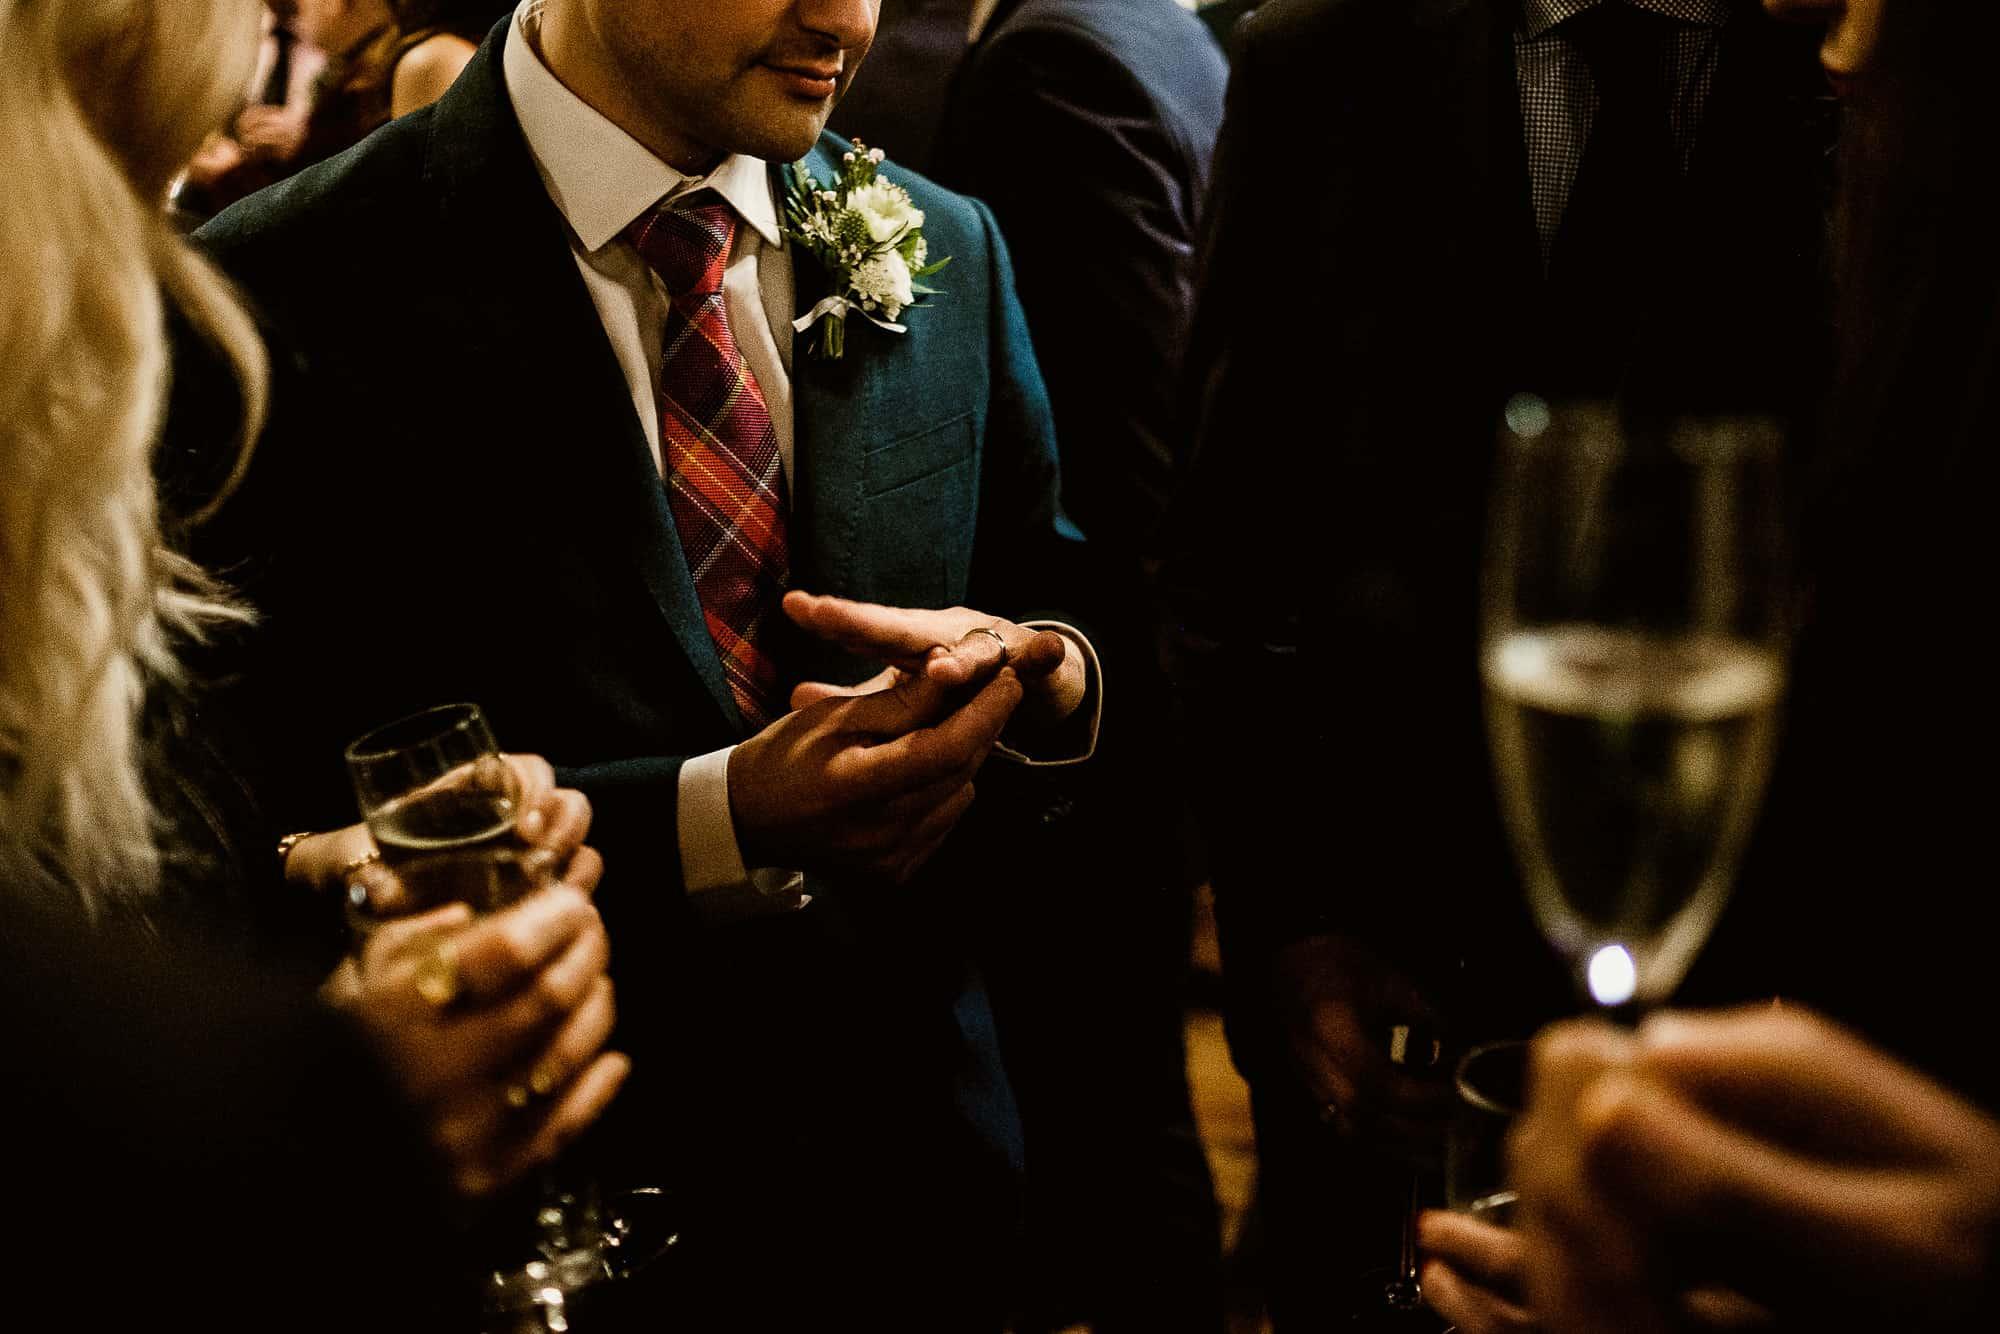 st-stephens-wedding-photographer-matt-tyler-0040